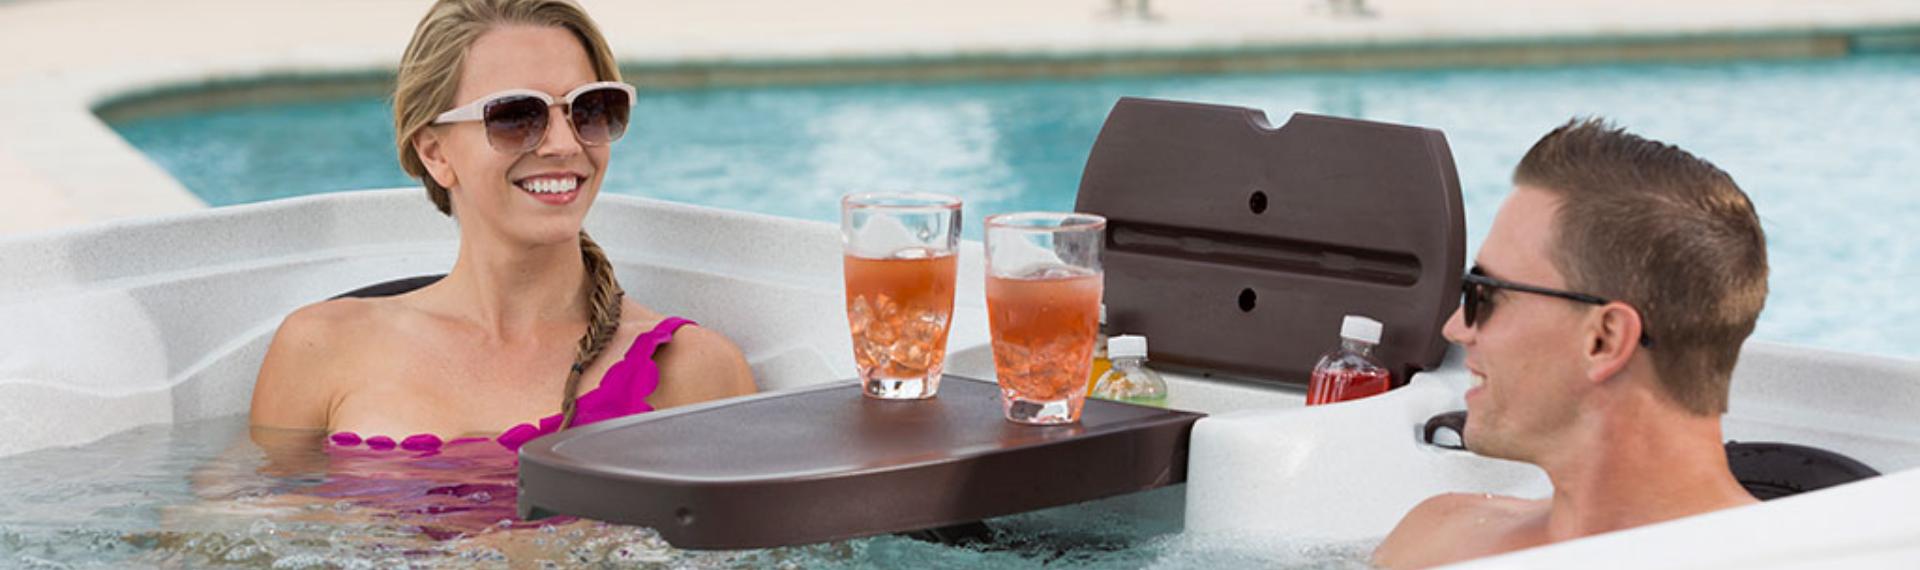 Cabana Suite Hot Tub | A6 Hot Tubs